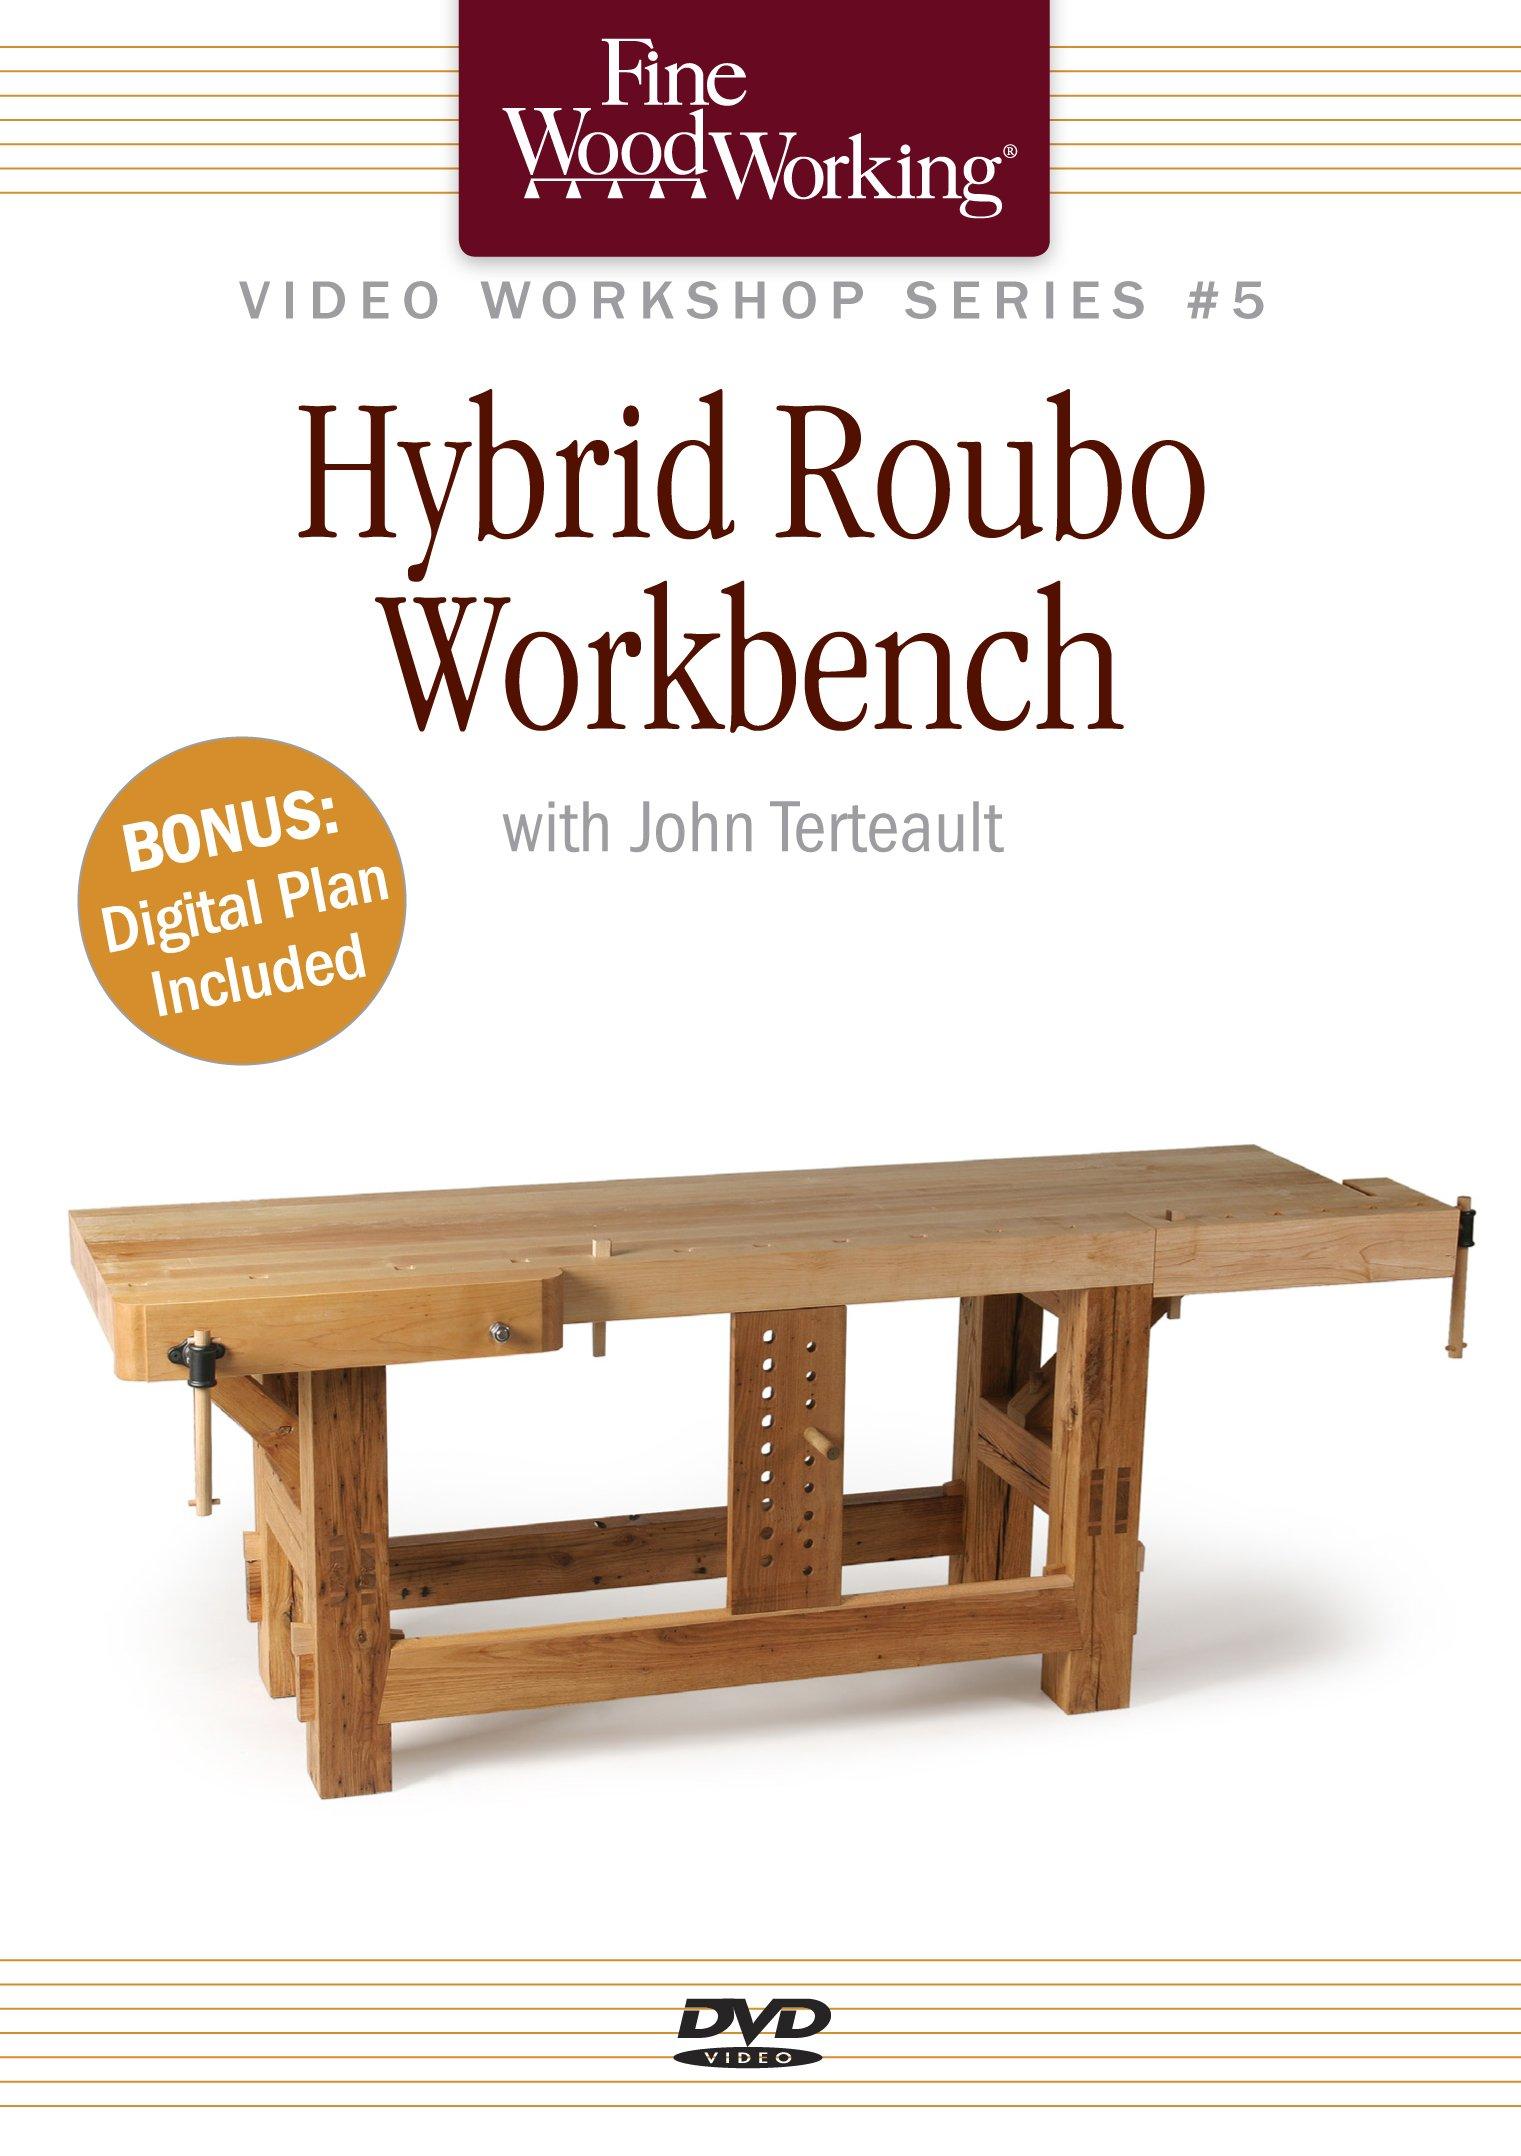 Fine Woodworking Video Workshop Series - Hybrid Roubo Workbench